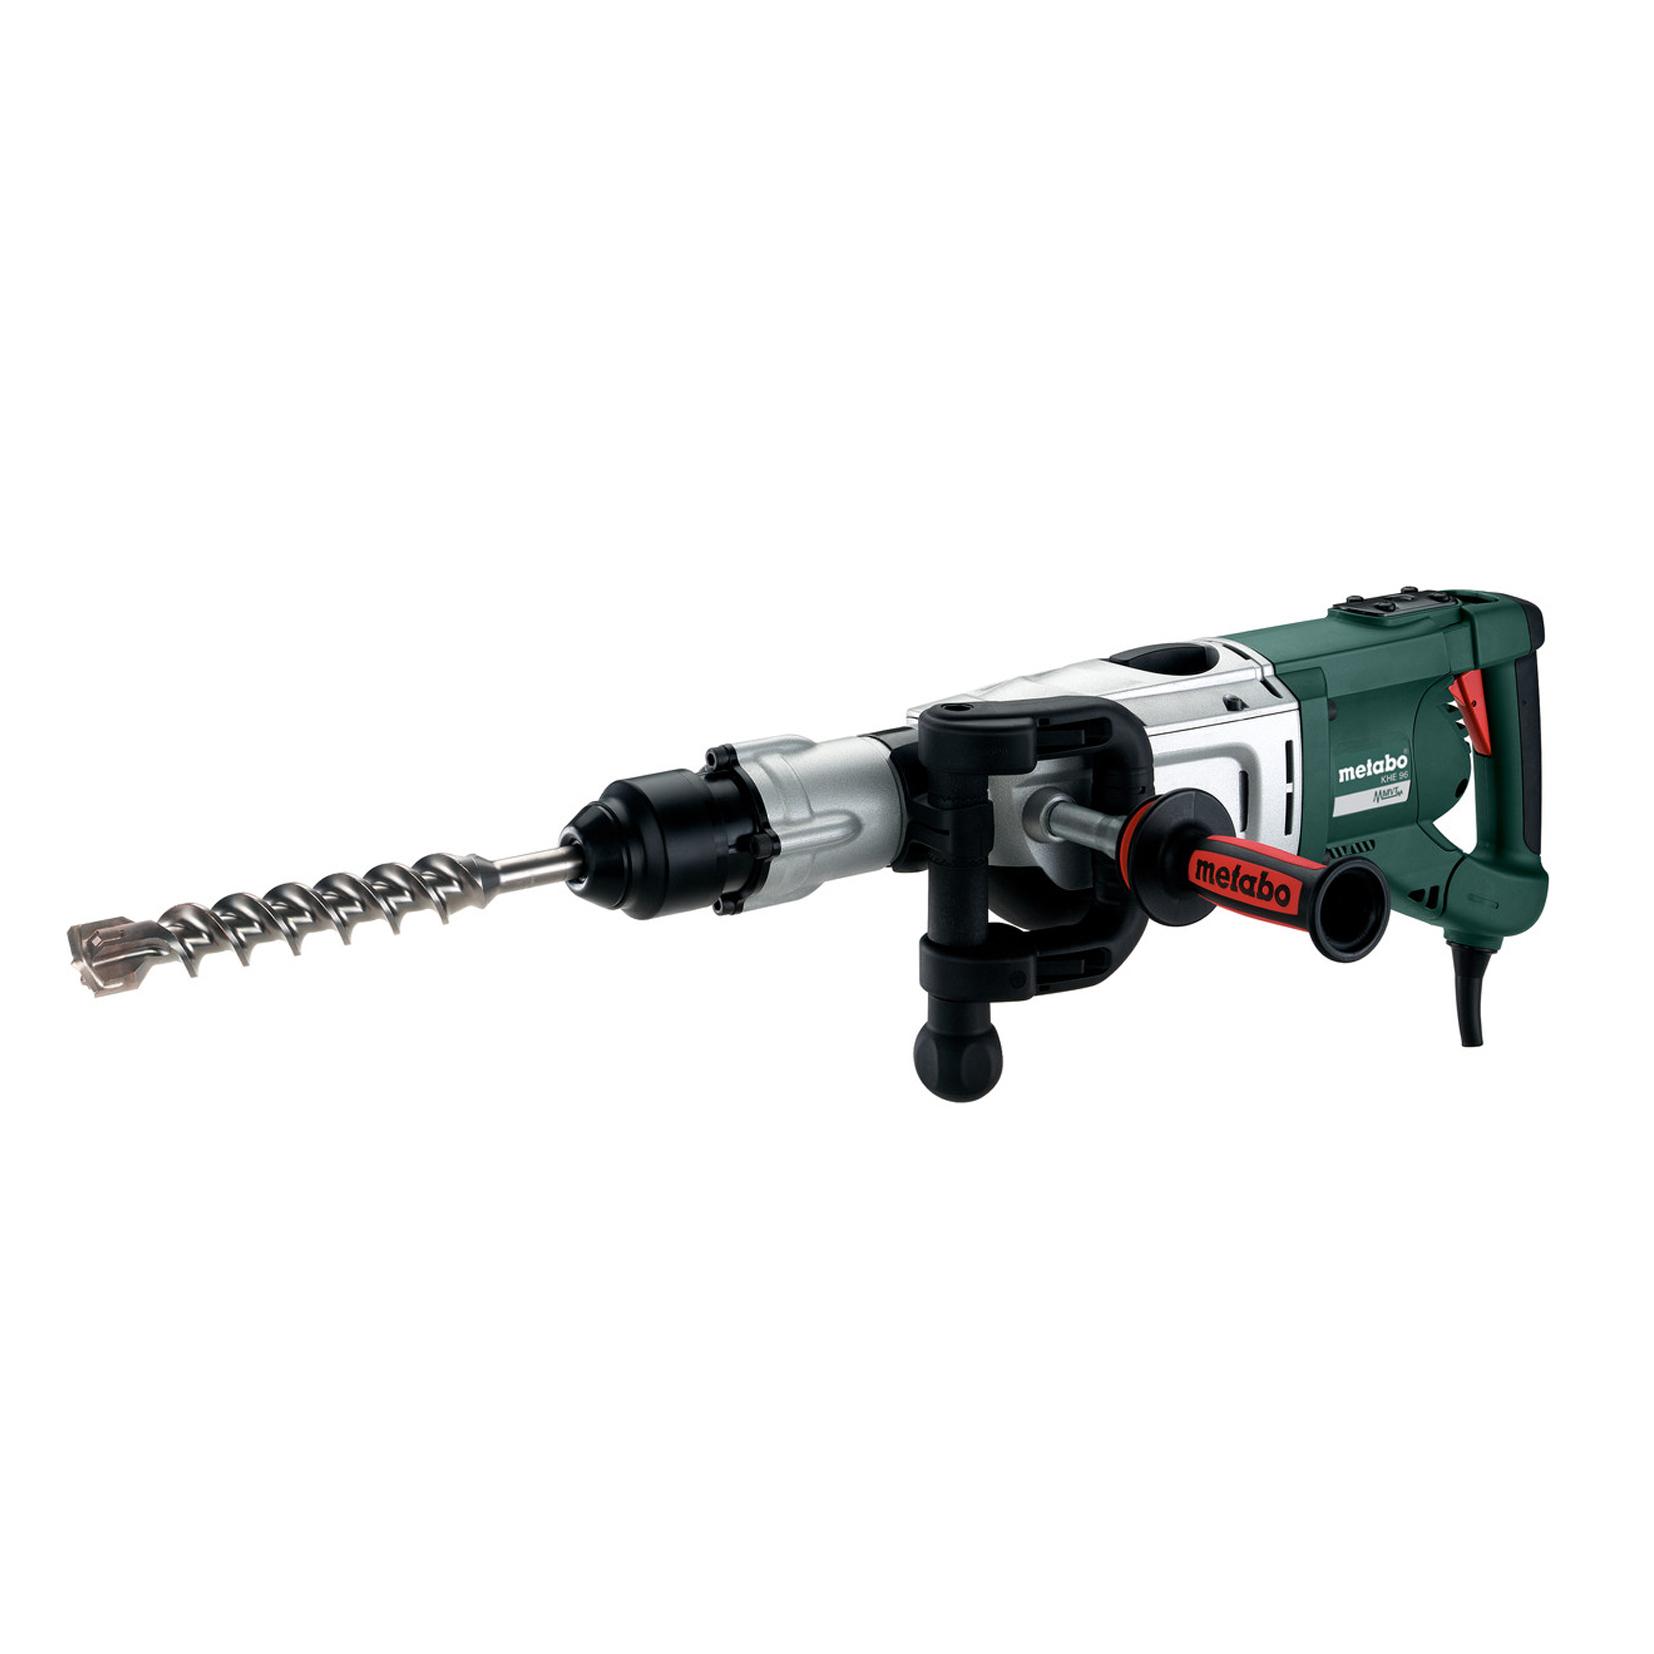 11kg Drill Breaker